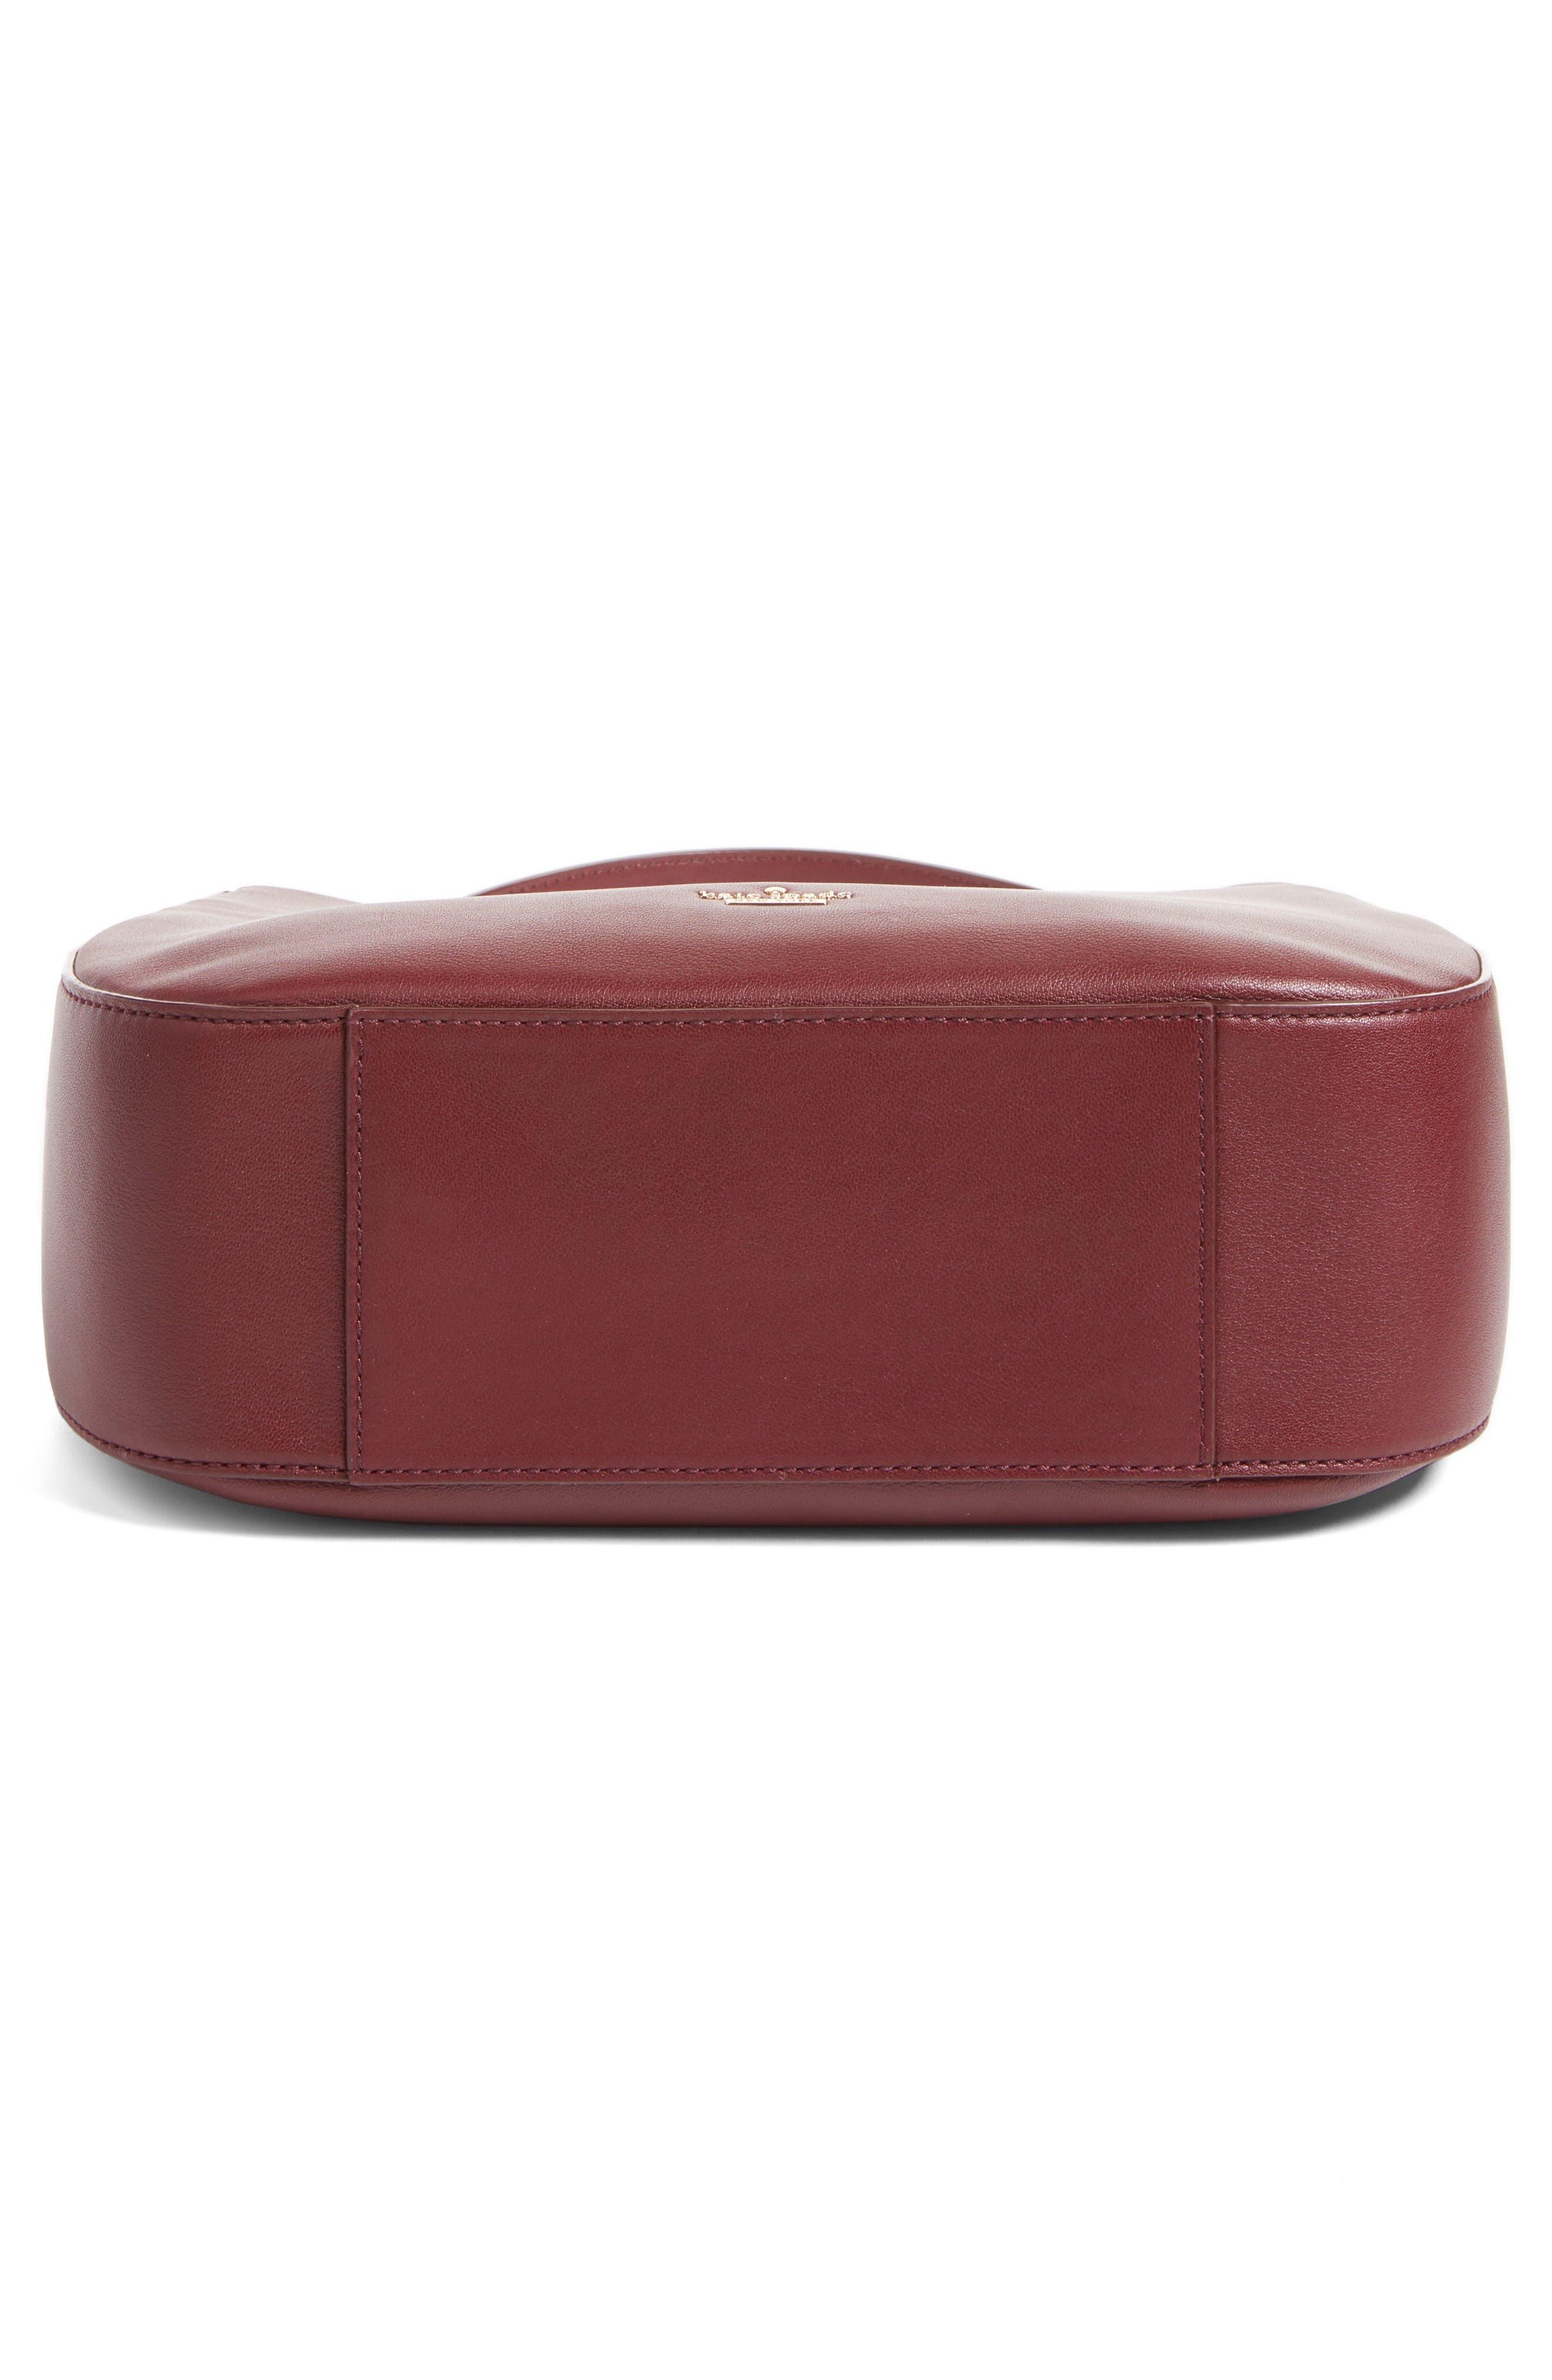 robson lane sana leather shoulder bag,                             Alternate thumbnail 6, color,                             Cherry Wood